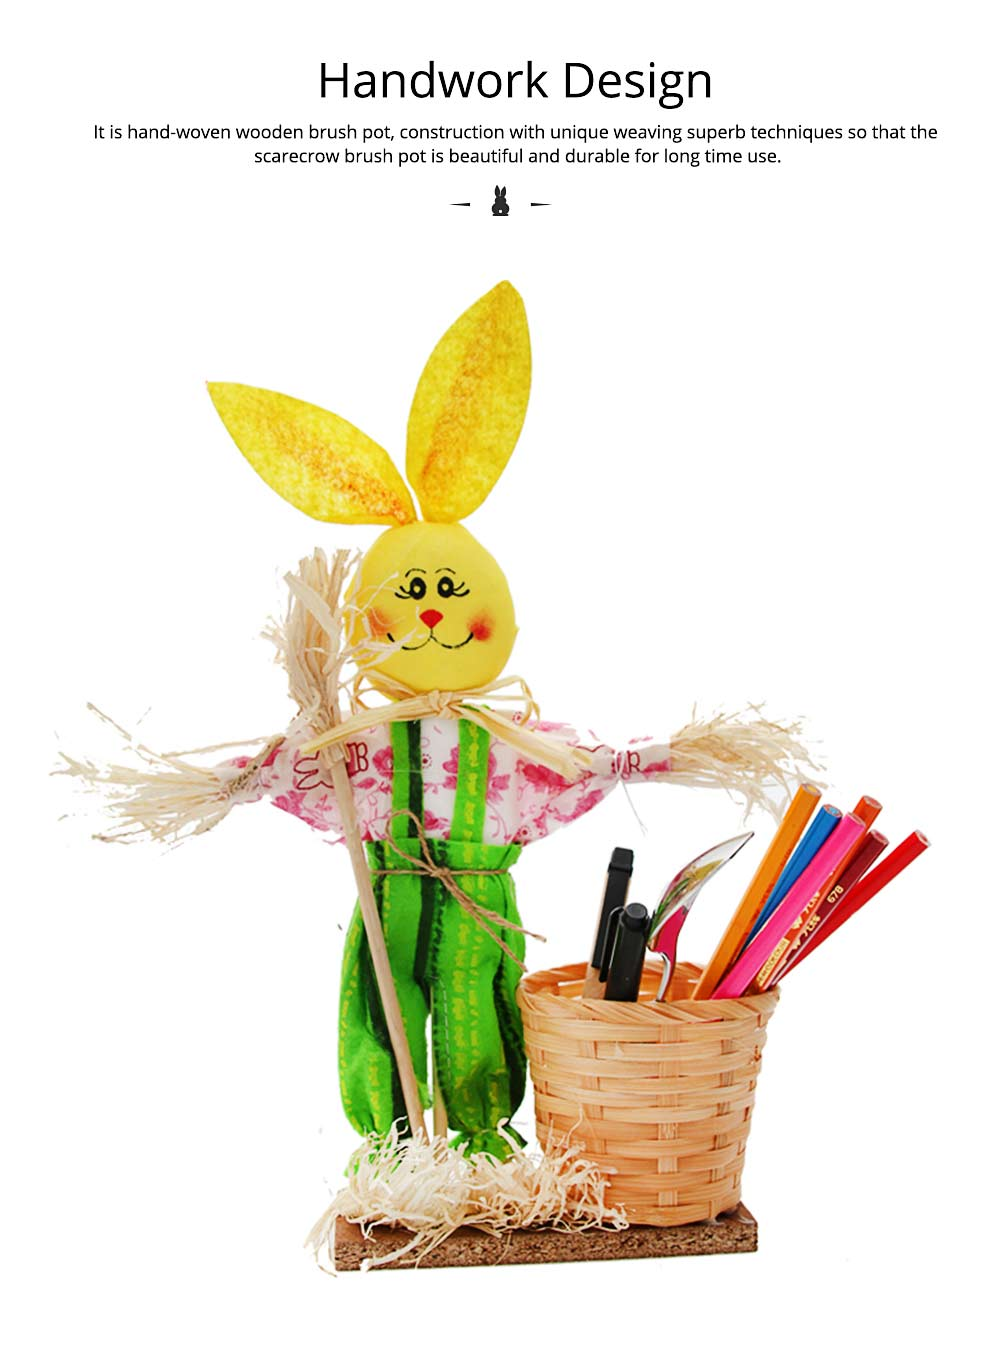 Easter Bunny Decorates as Brush Pot with Cute Rabbit Scarecrow Design, Kindergarten Gift 4